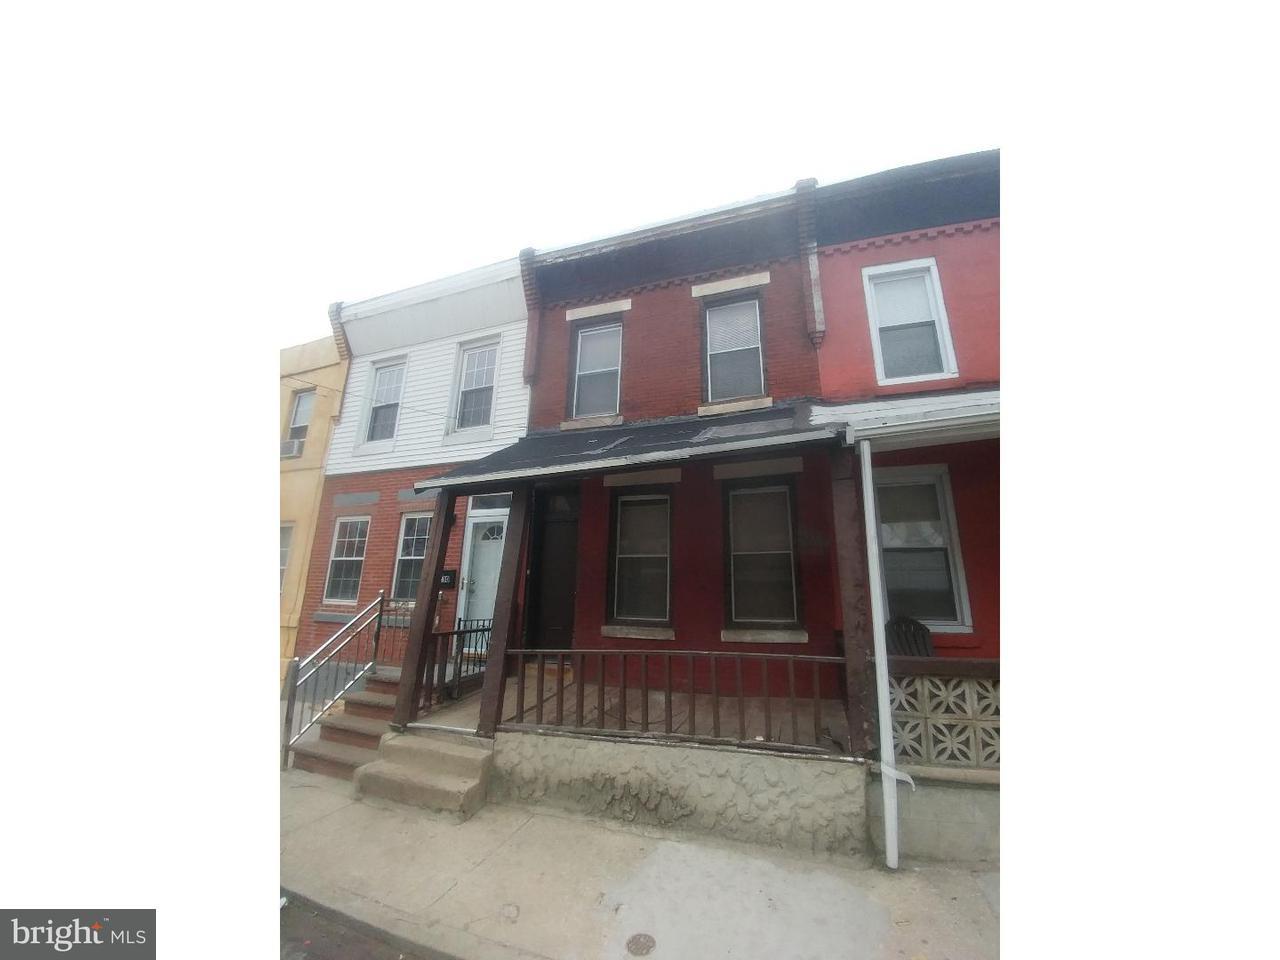 1228 S Bucknell Philadelphia, PA 19146